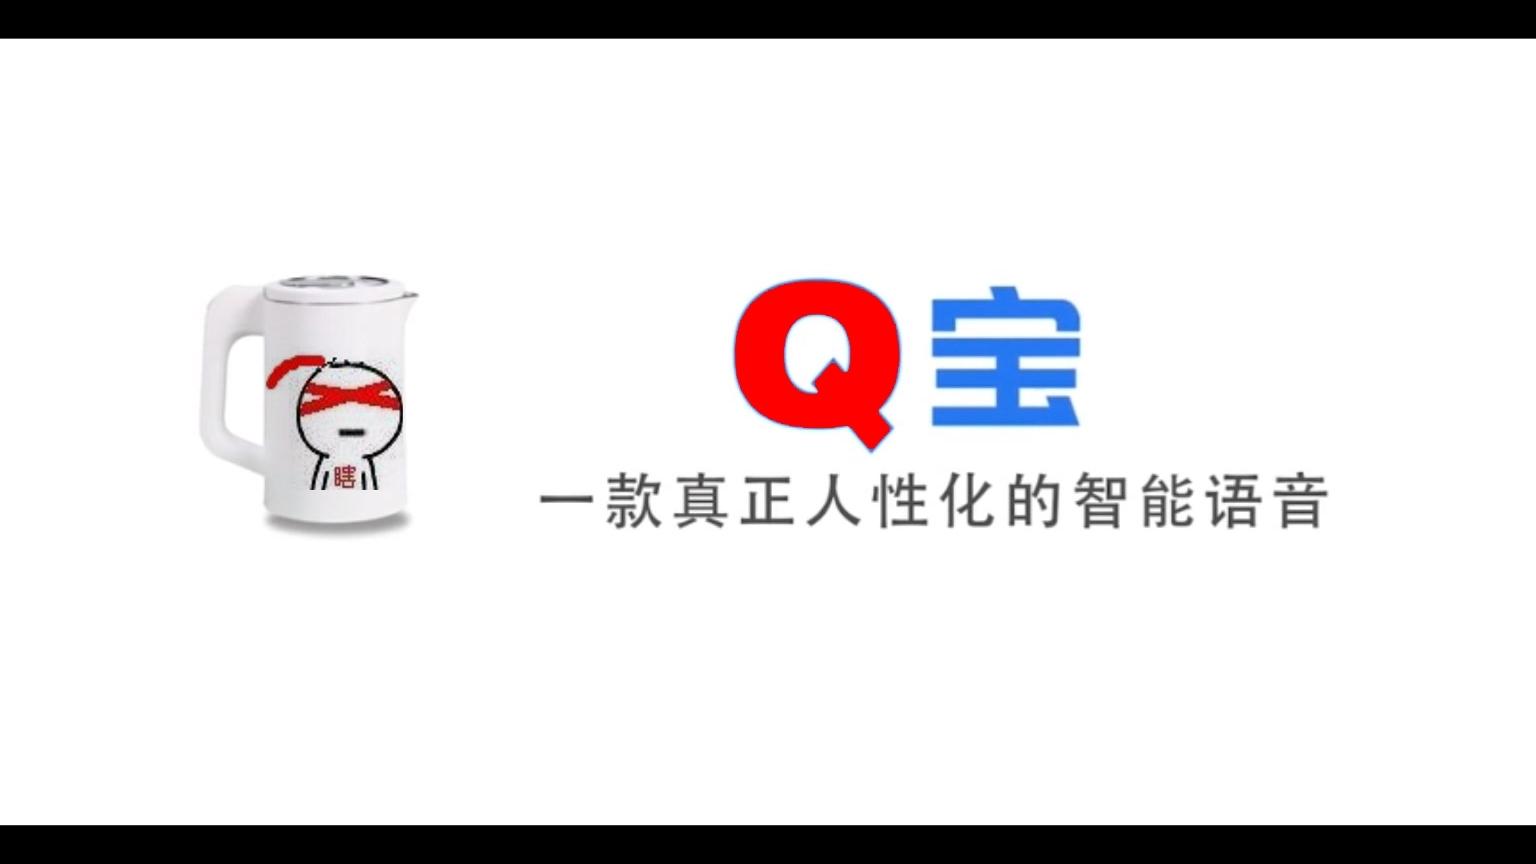 【Q宝】Q老师语音包现已上线